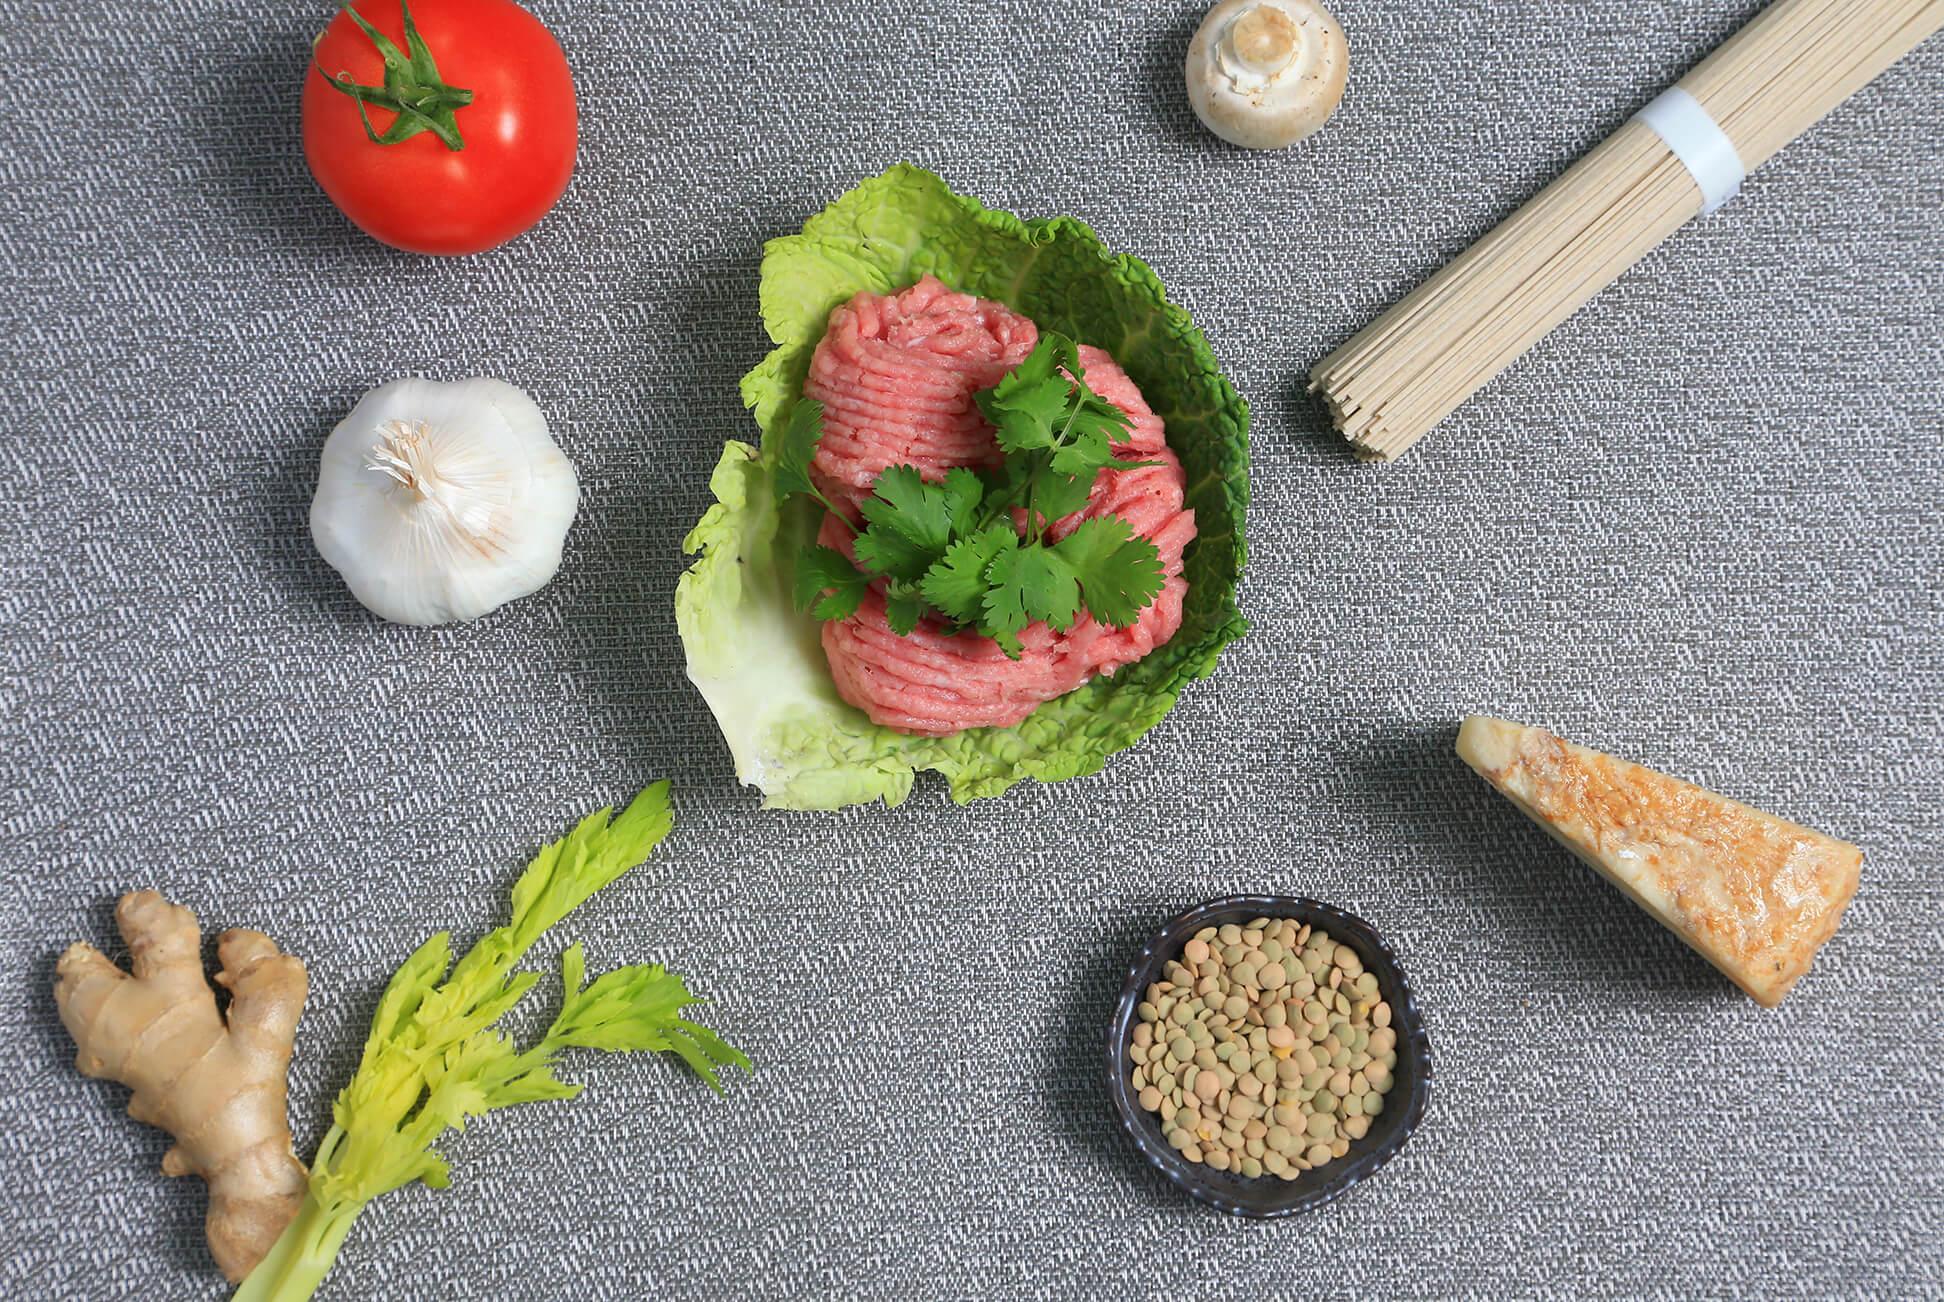 greenmake-food-photography4.jpg